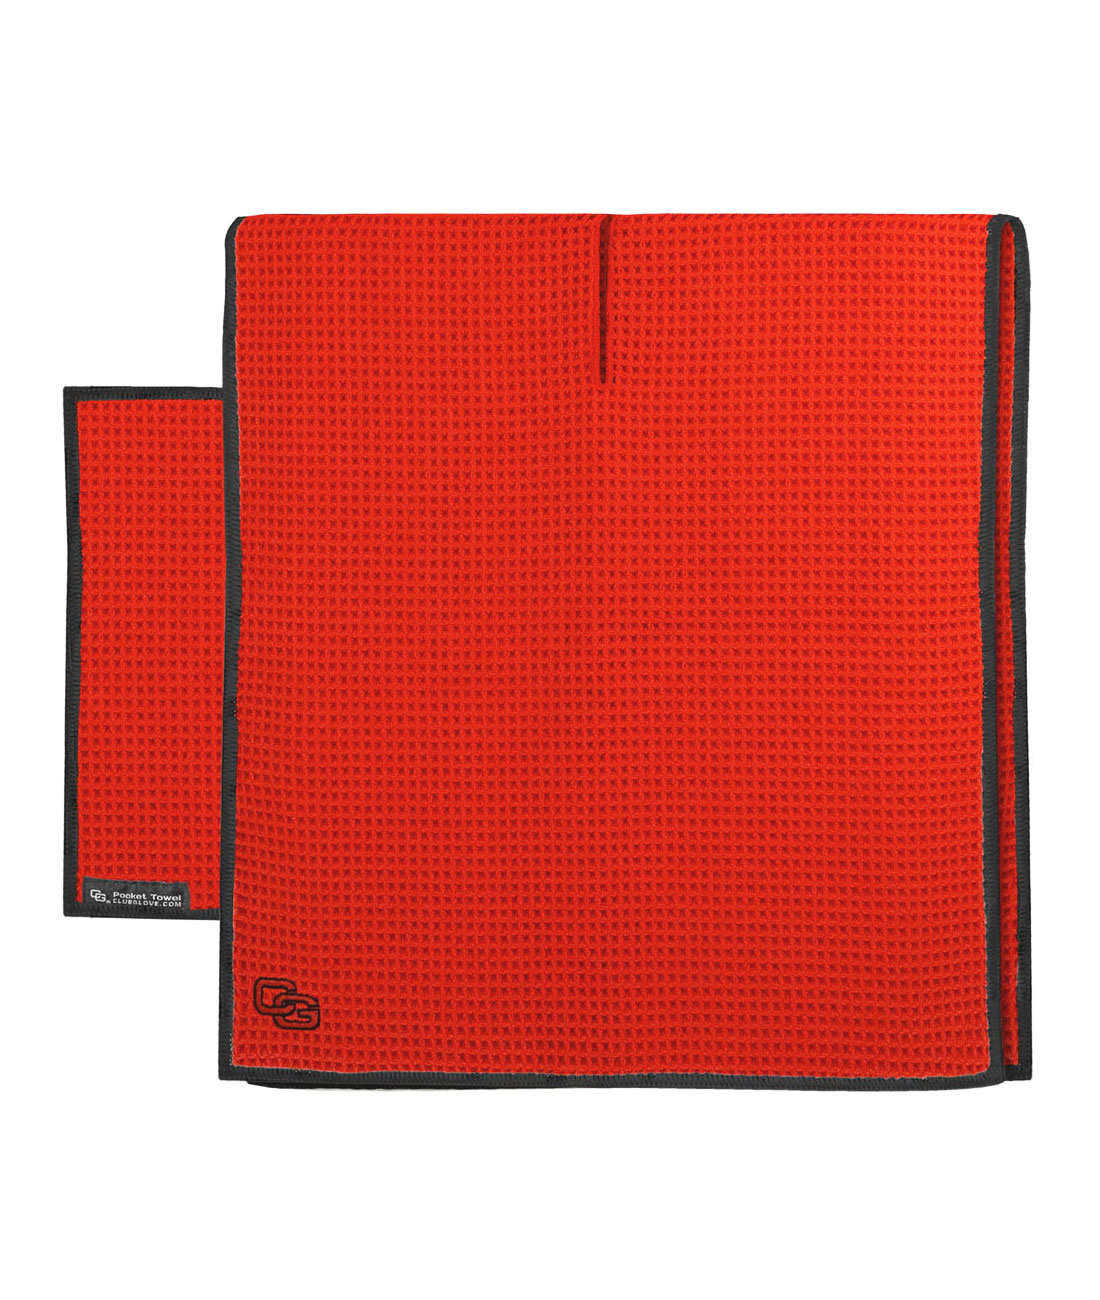 Golf's Best Microfiber Towel - Club Glove